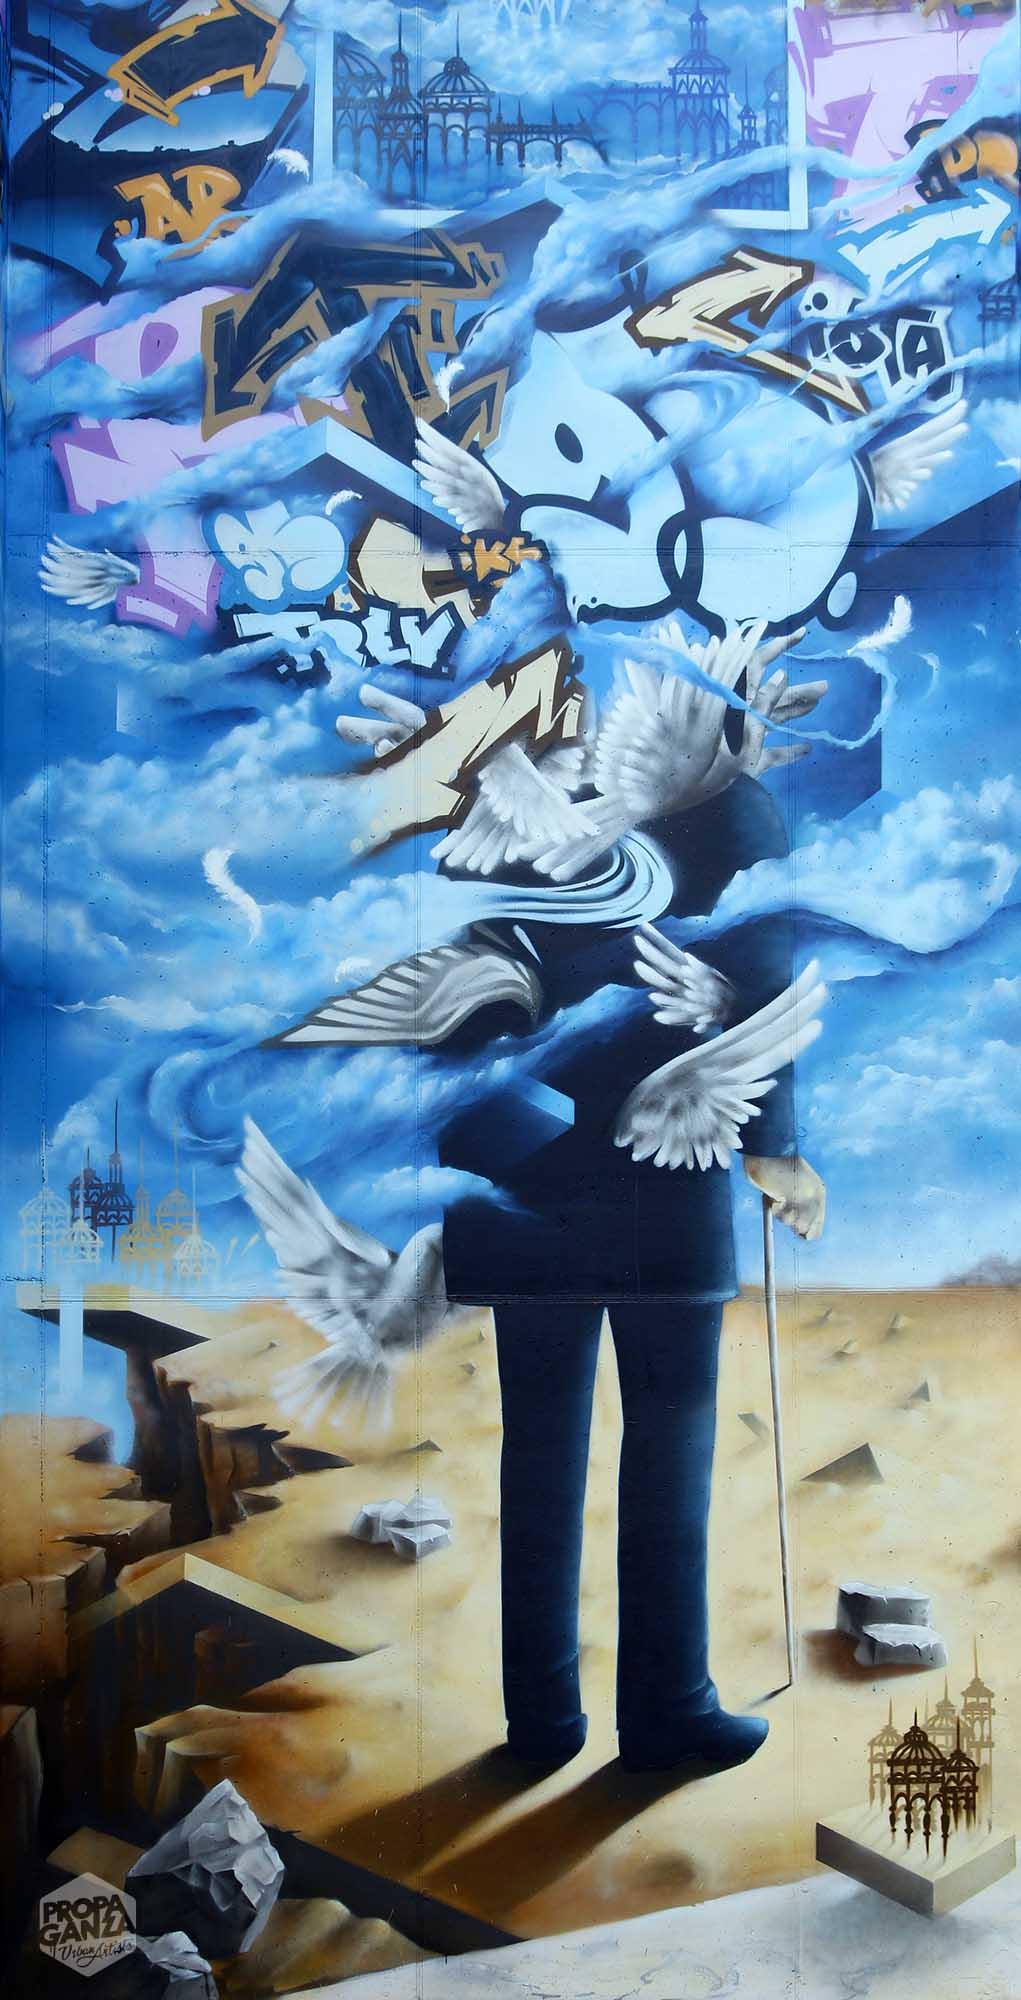 https://www.propaganza.be/wp-content/uploads/2016/05/propaganza-vivier-d-oie-uccle-belgium-graffiti-spraypaint-street-art-fresque-magritte-orkez-trevor-roubens-iota-piet-rodriguez-2.jpg